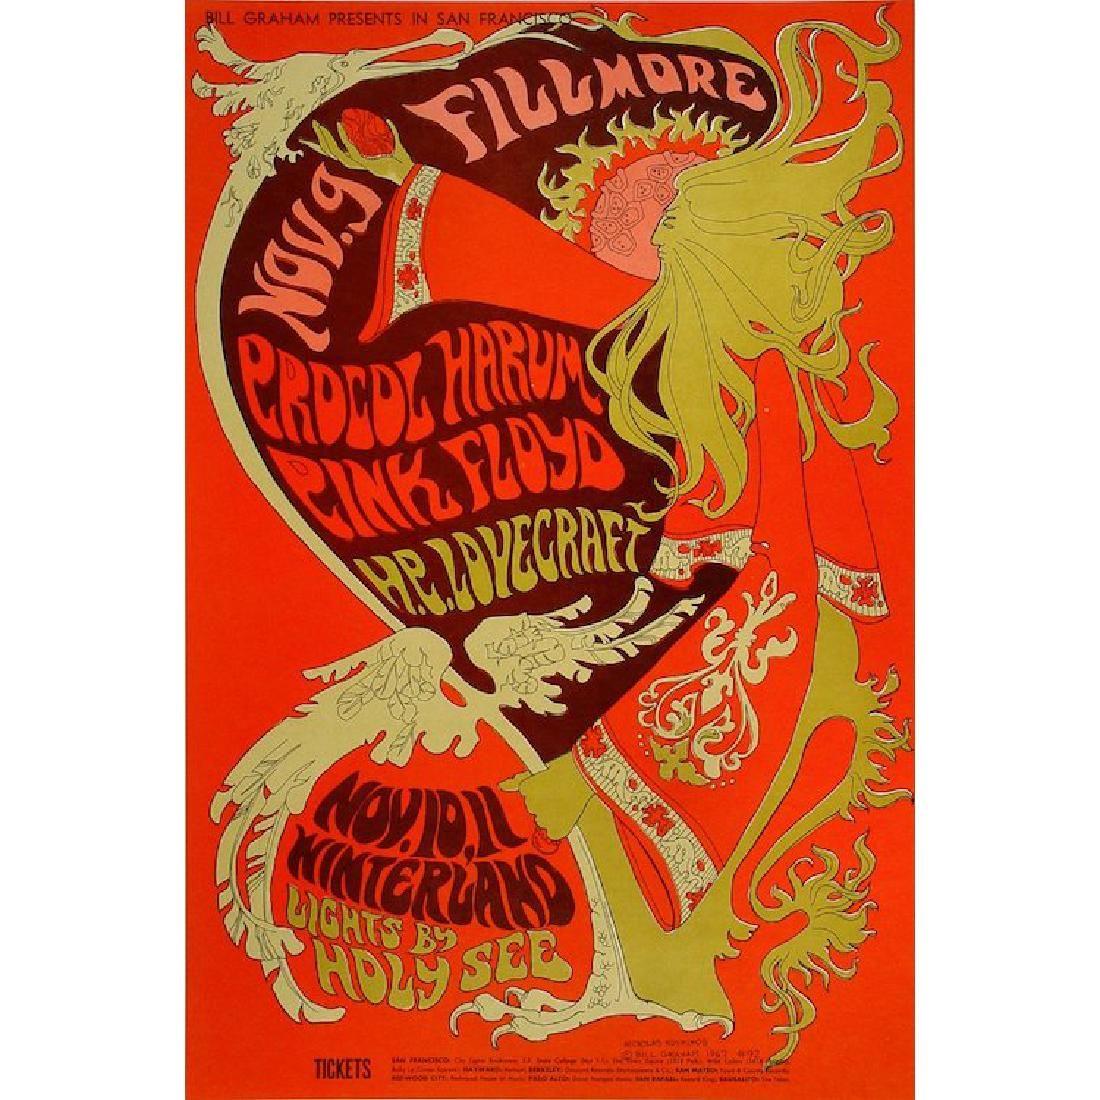 Pink Floyd - Procol Harum - 1967 Concert Poster